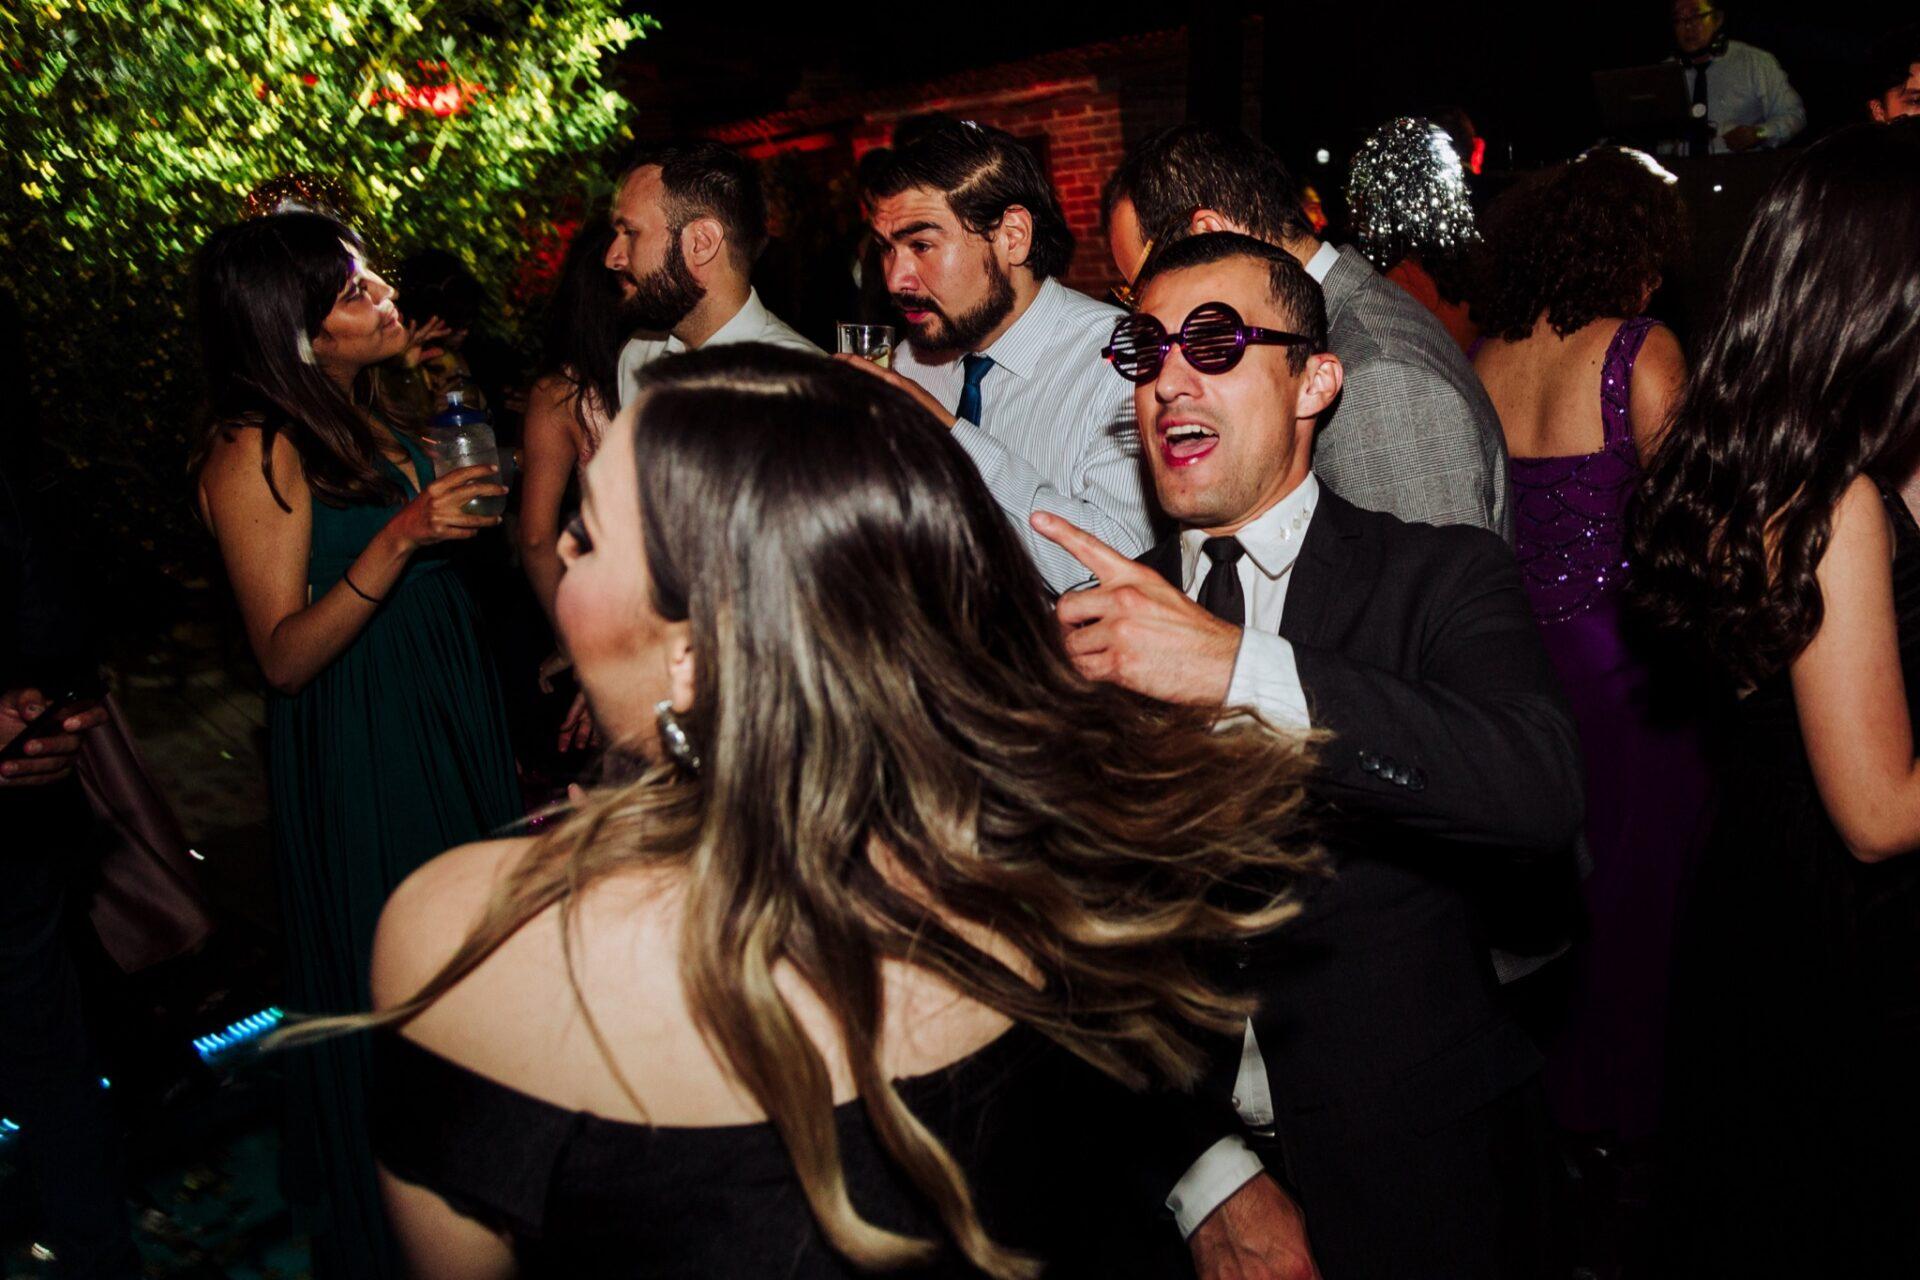 javier_noriega_fotografo_bodas_teul_zacatecas_wedding_photographer41